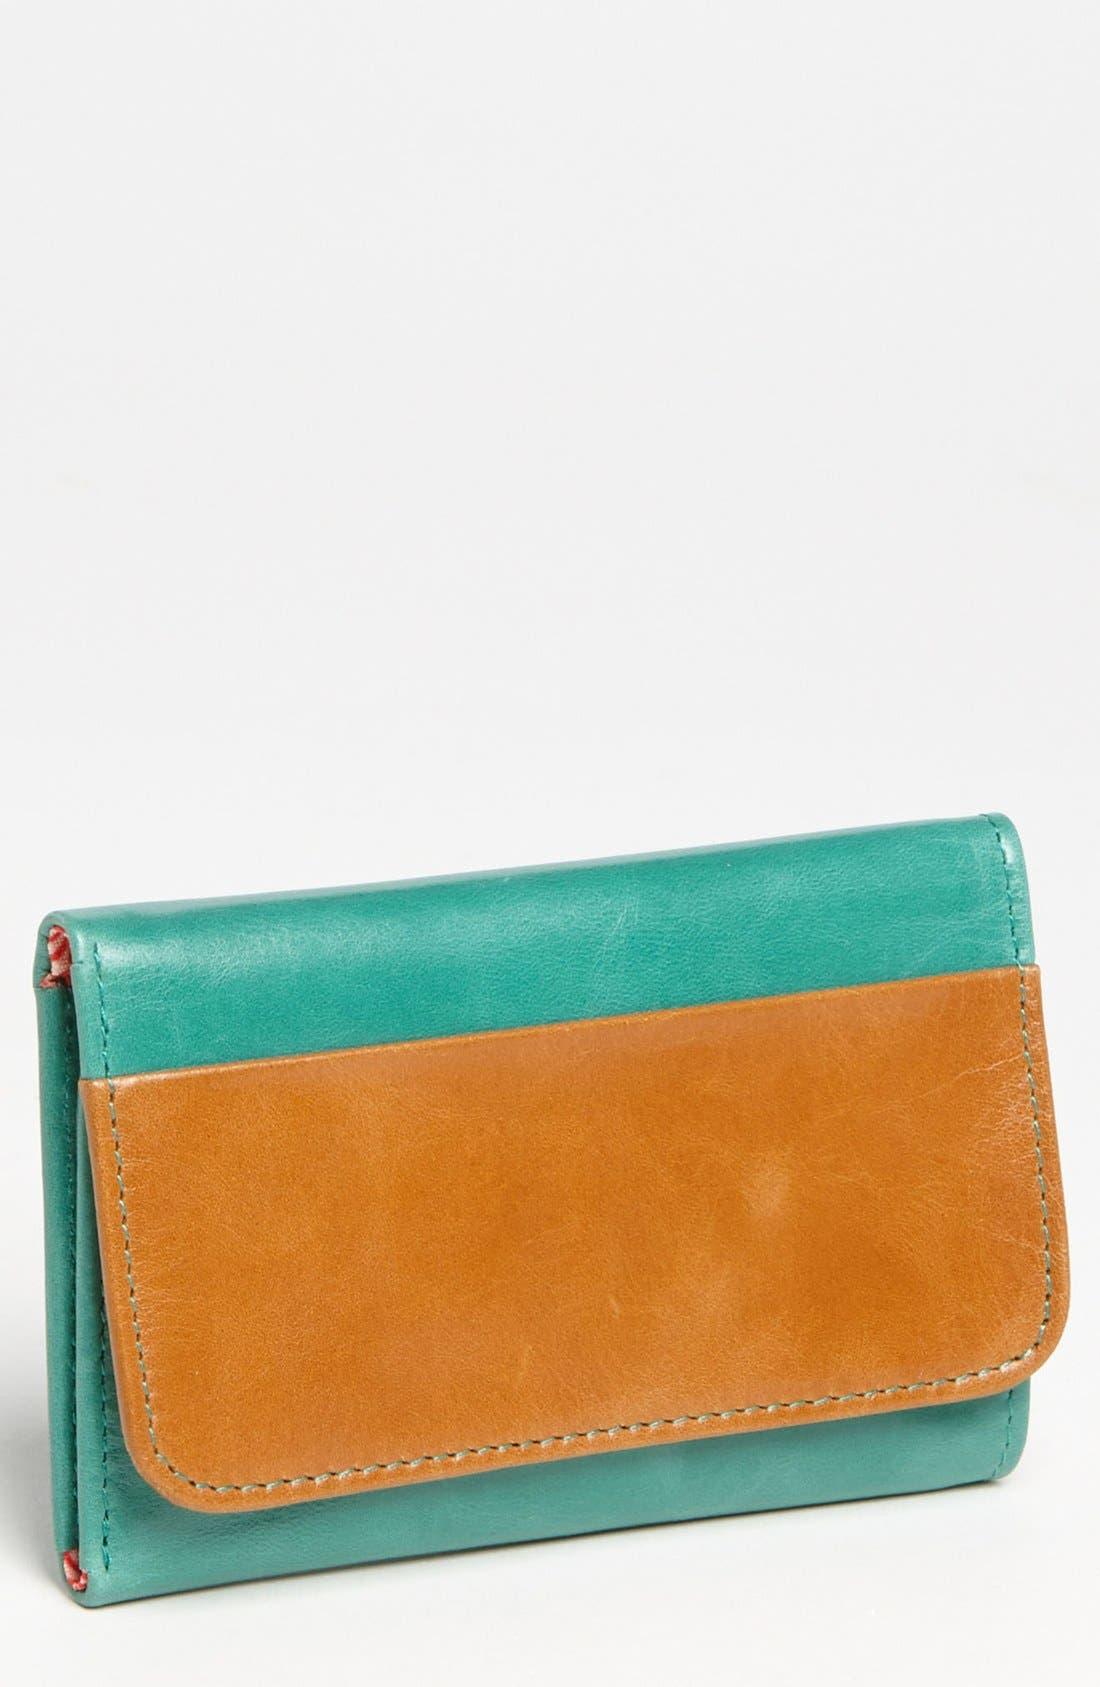 Alternate Image 1 Selected - Hobo 'Jill' Colorblock Wallet